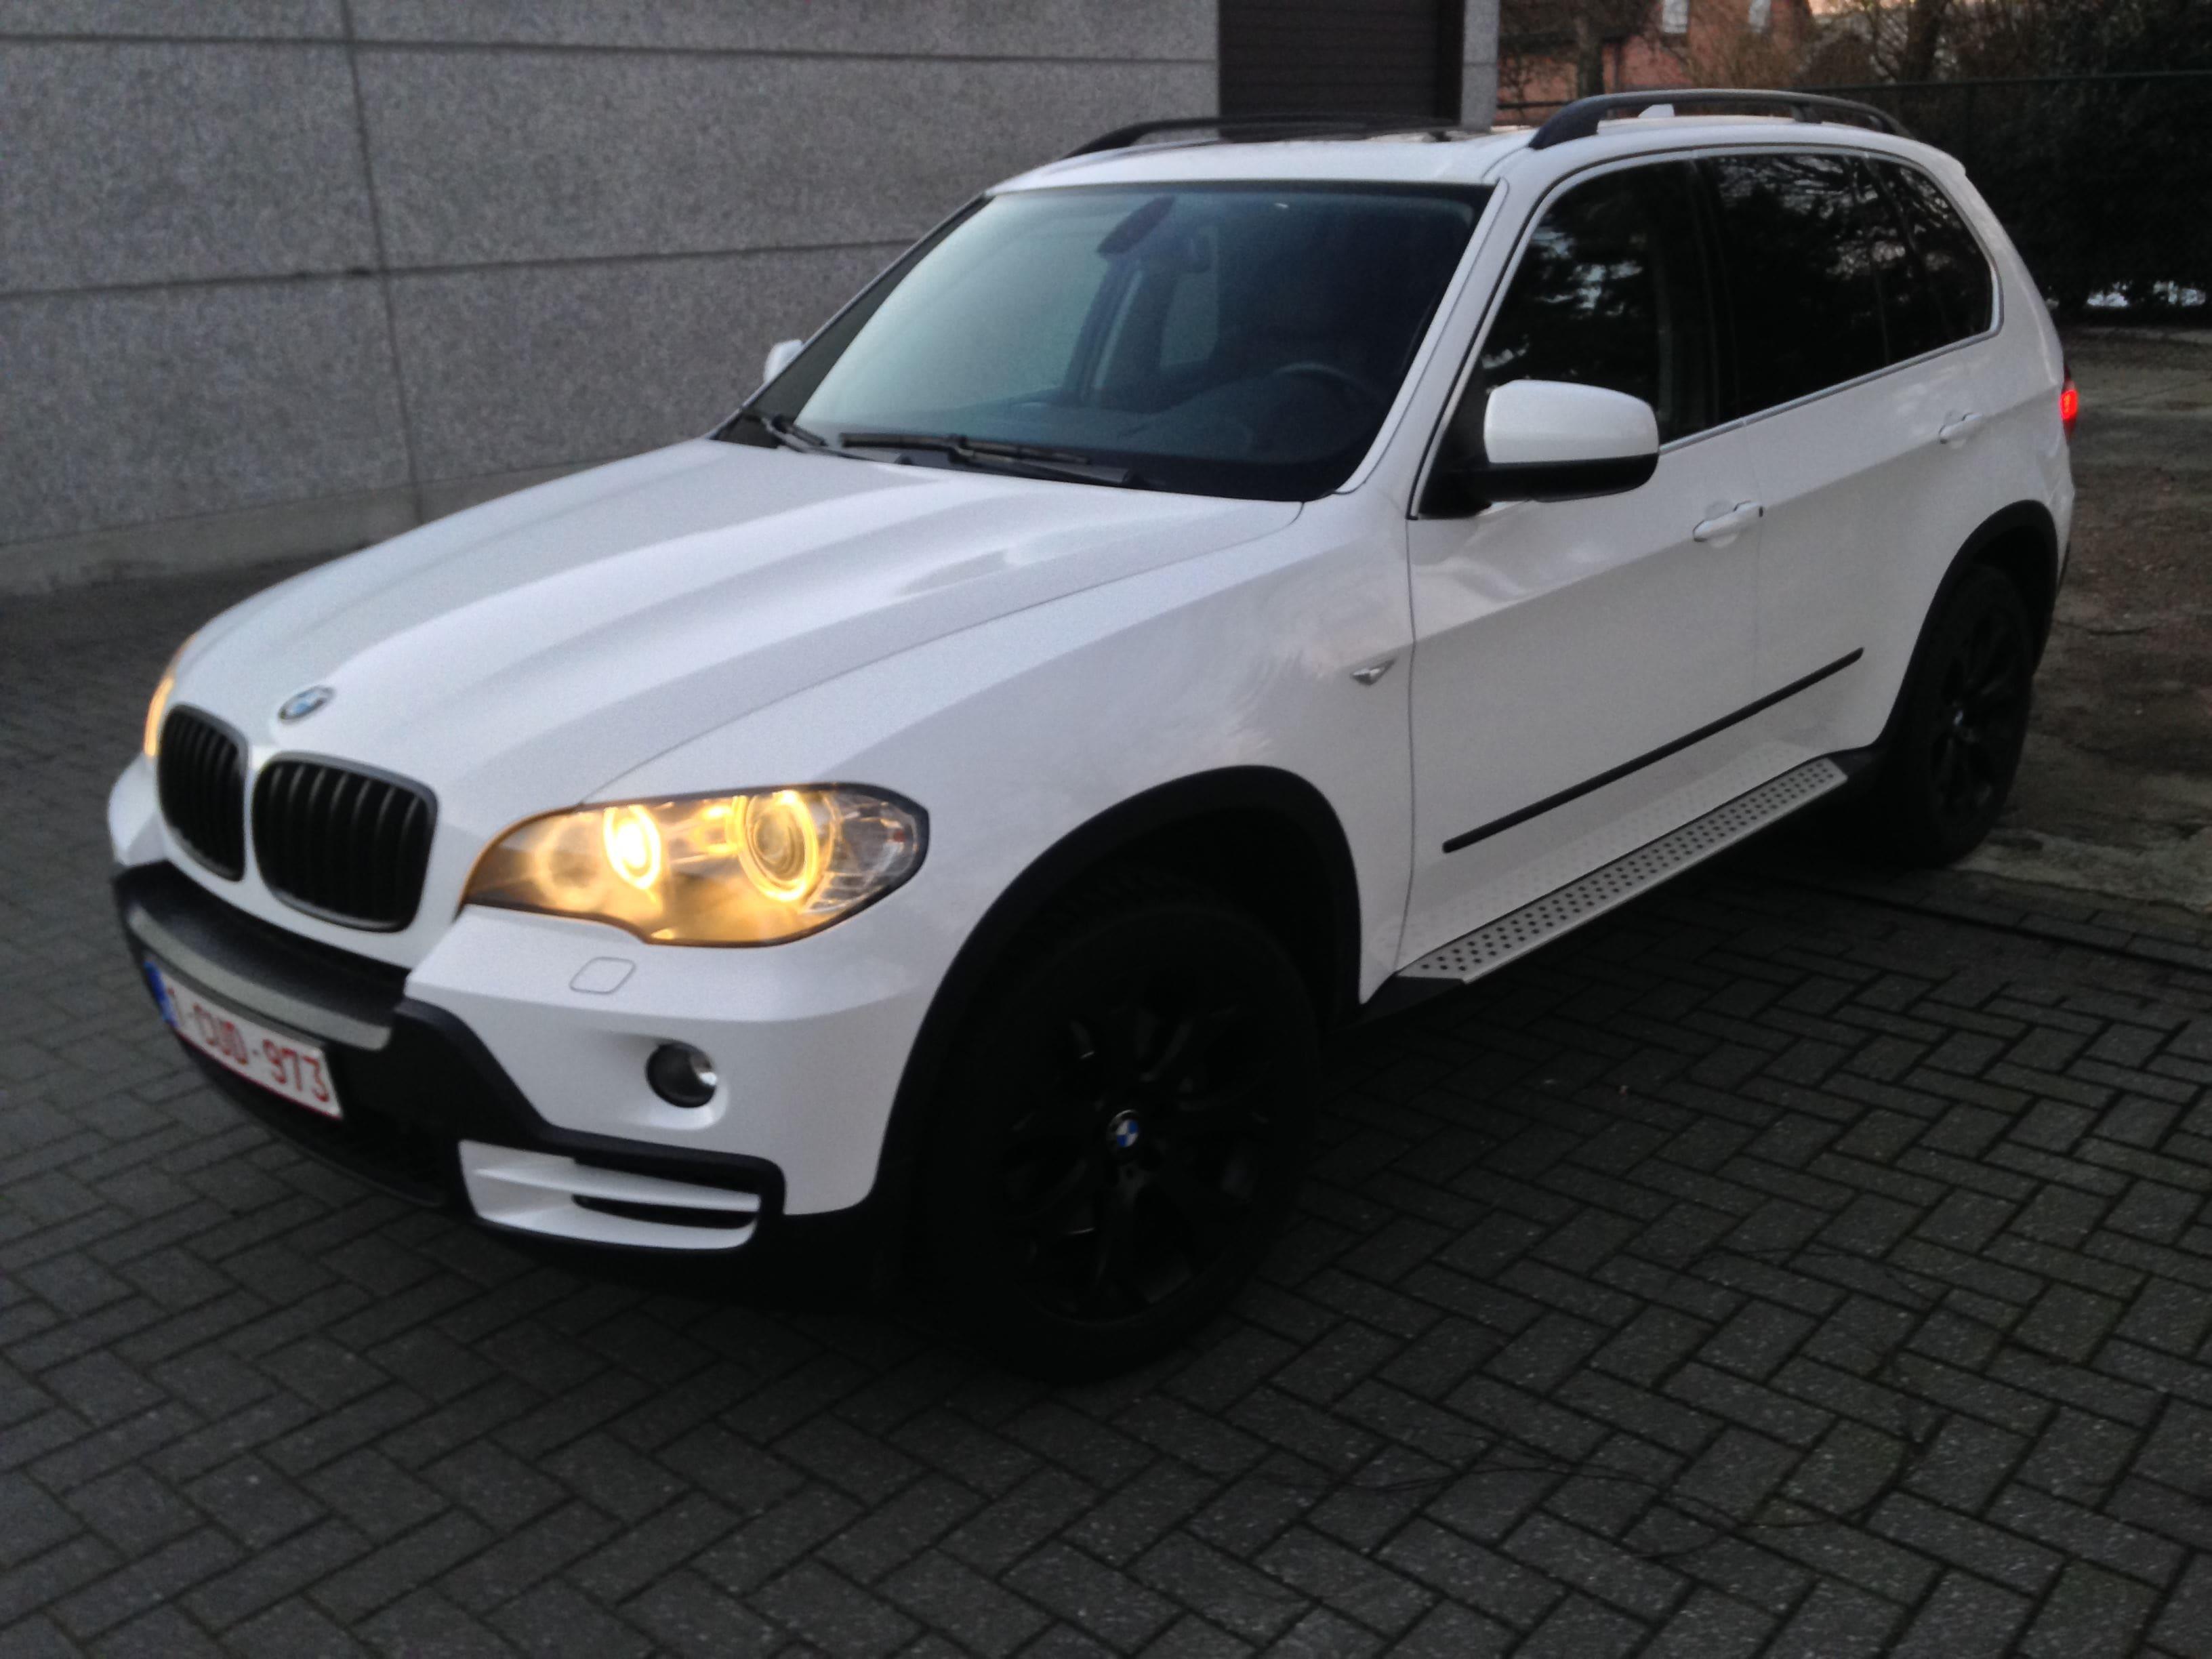 BMW X5 met Glossy White Wrap, Carwrapping door Wrapmyride.nu Foto-nr:5433, ©2021